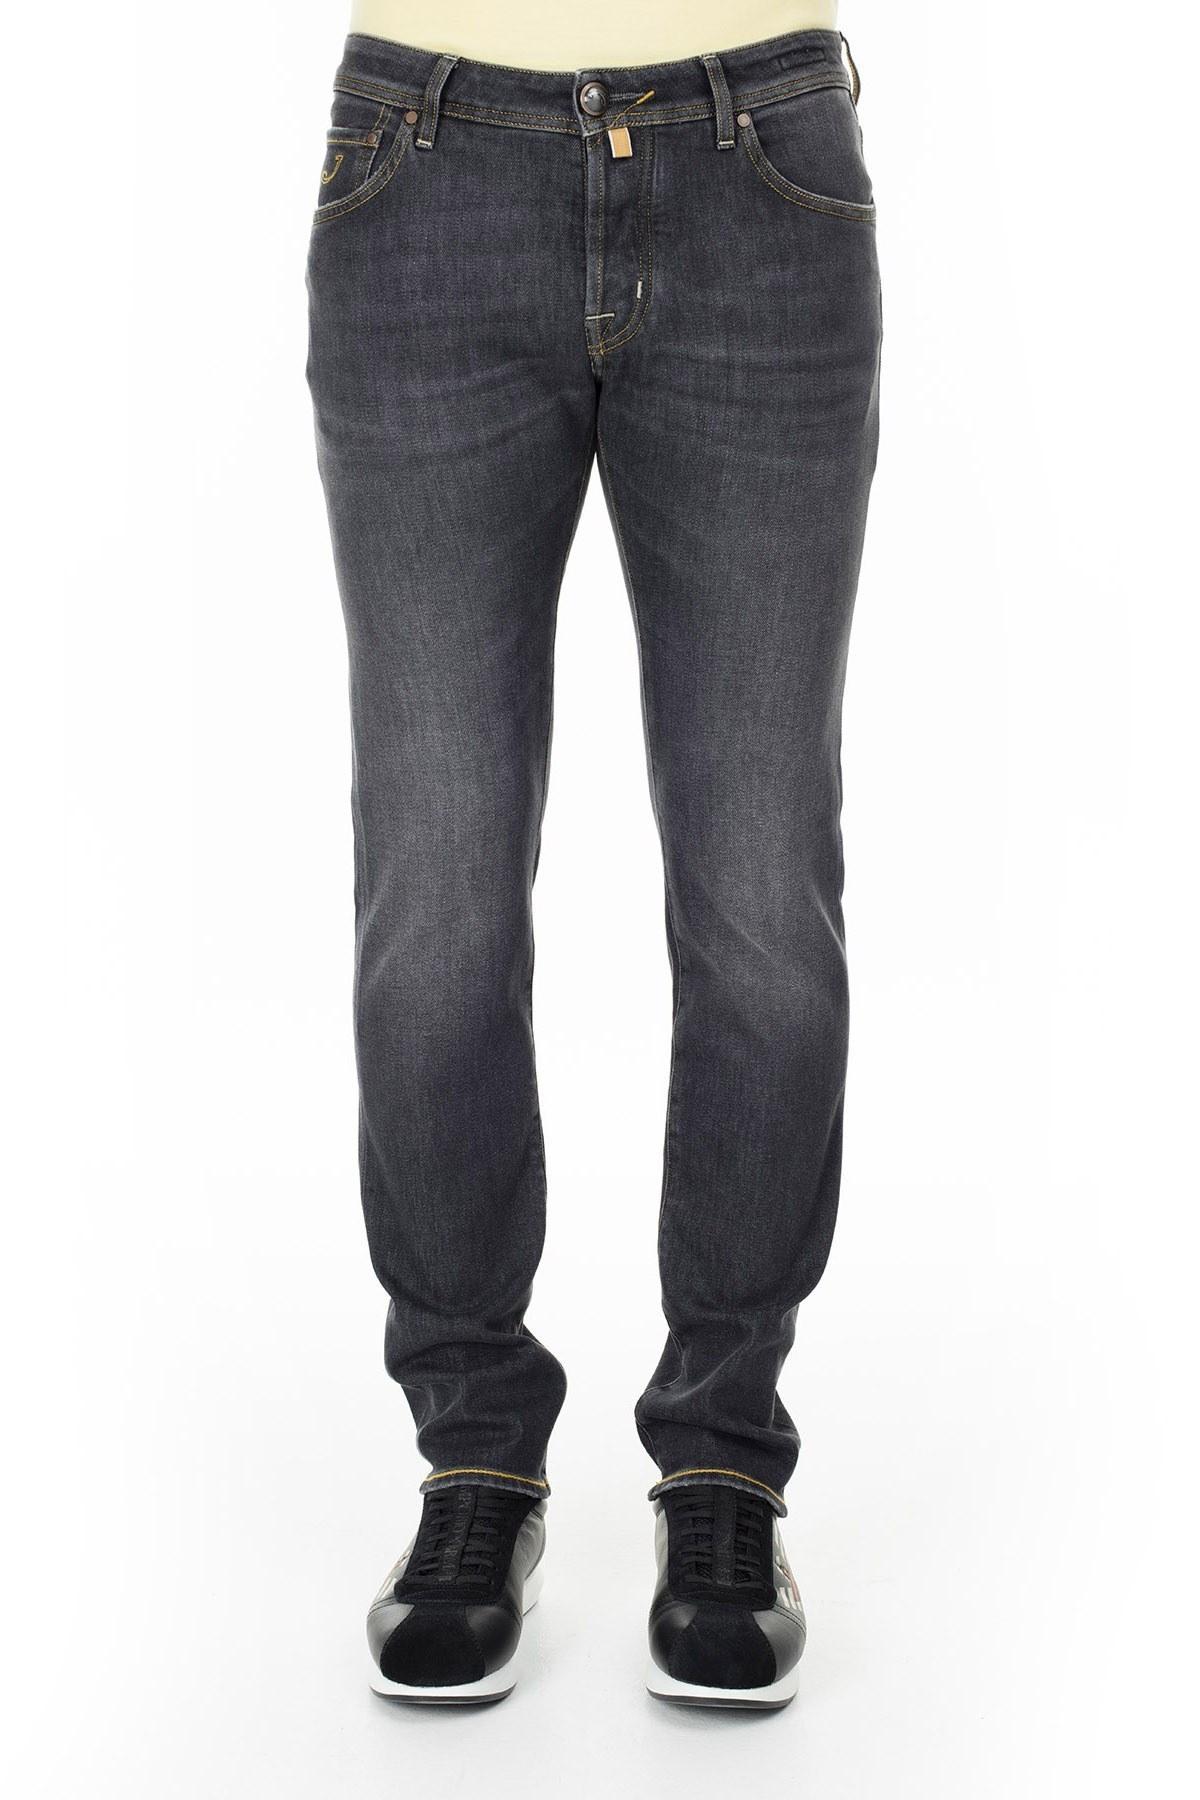 Jacob Cohen Jeans Erkek Kot Pantolon J622 1865W1 001 FÜME